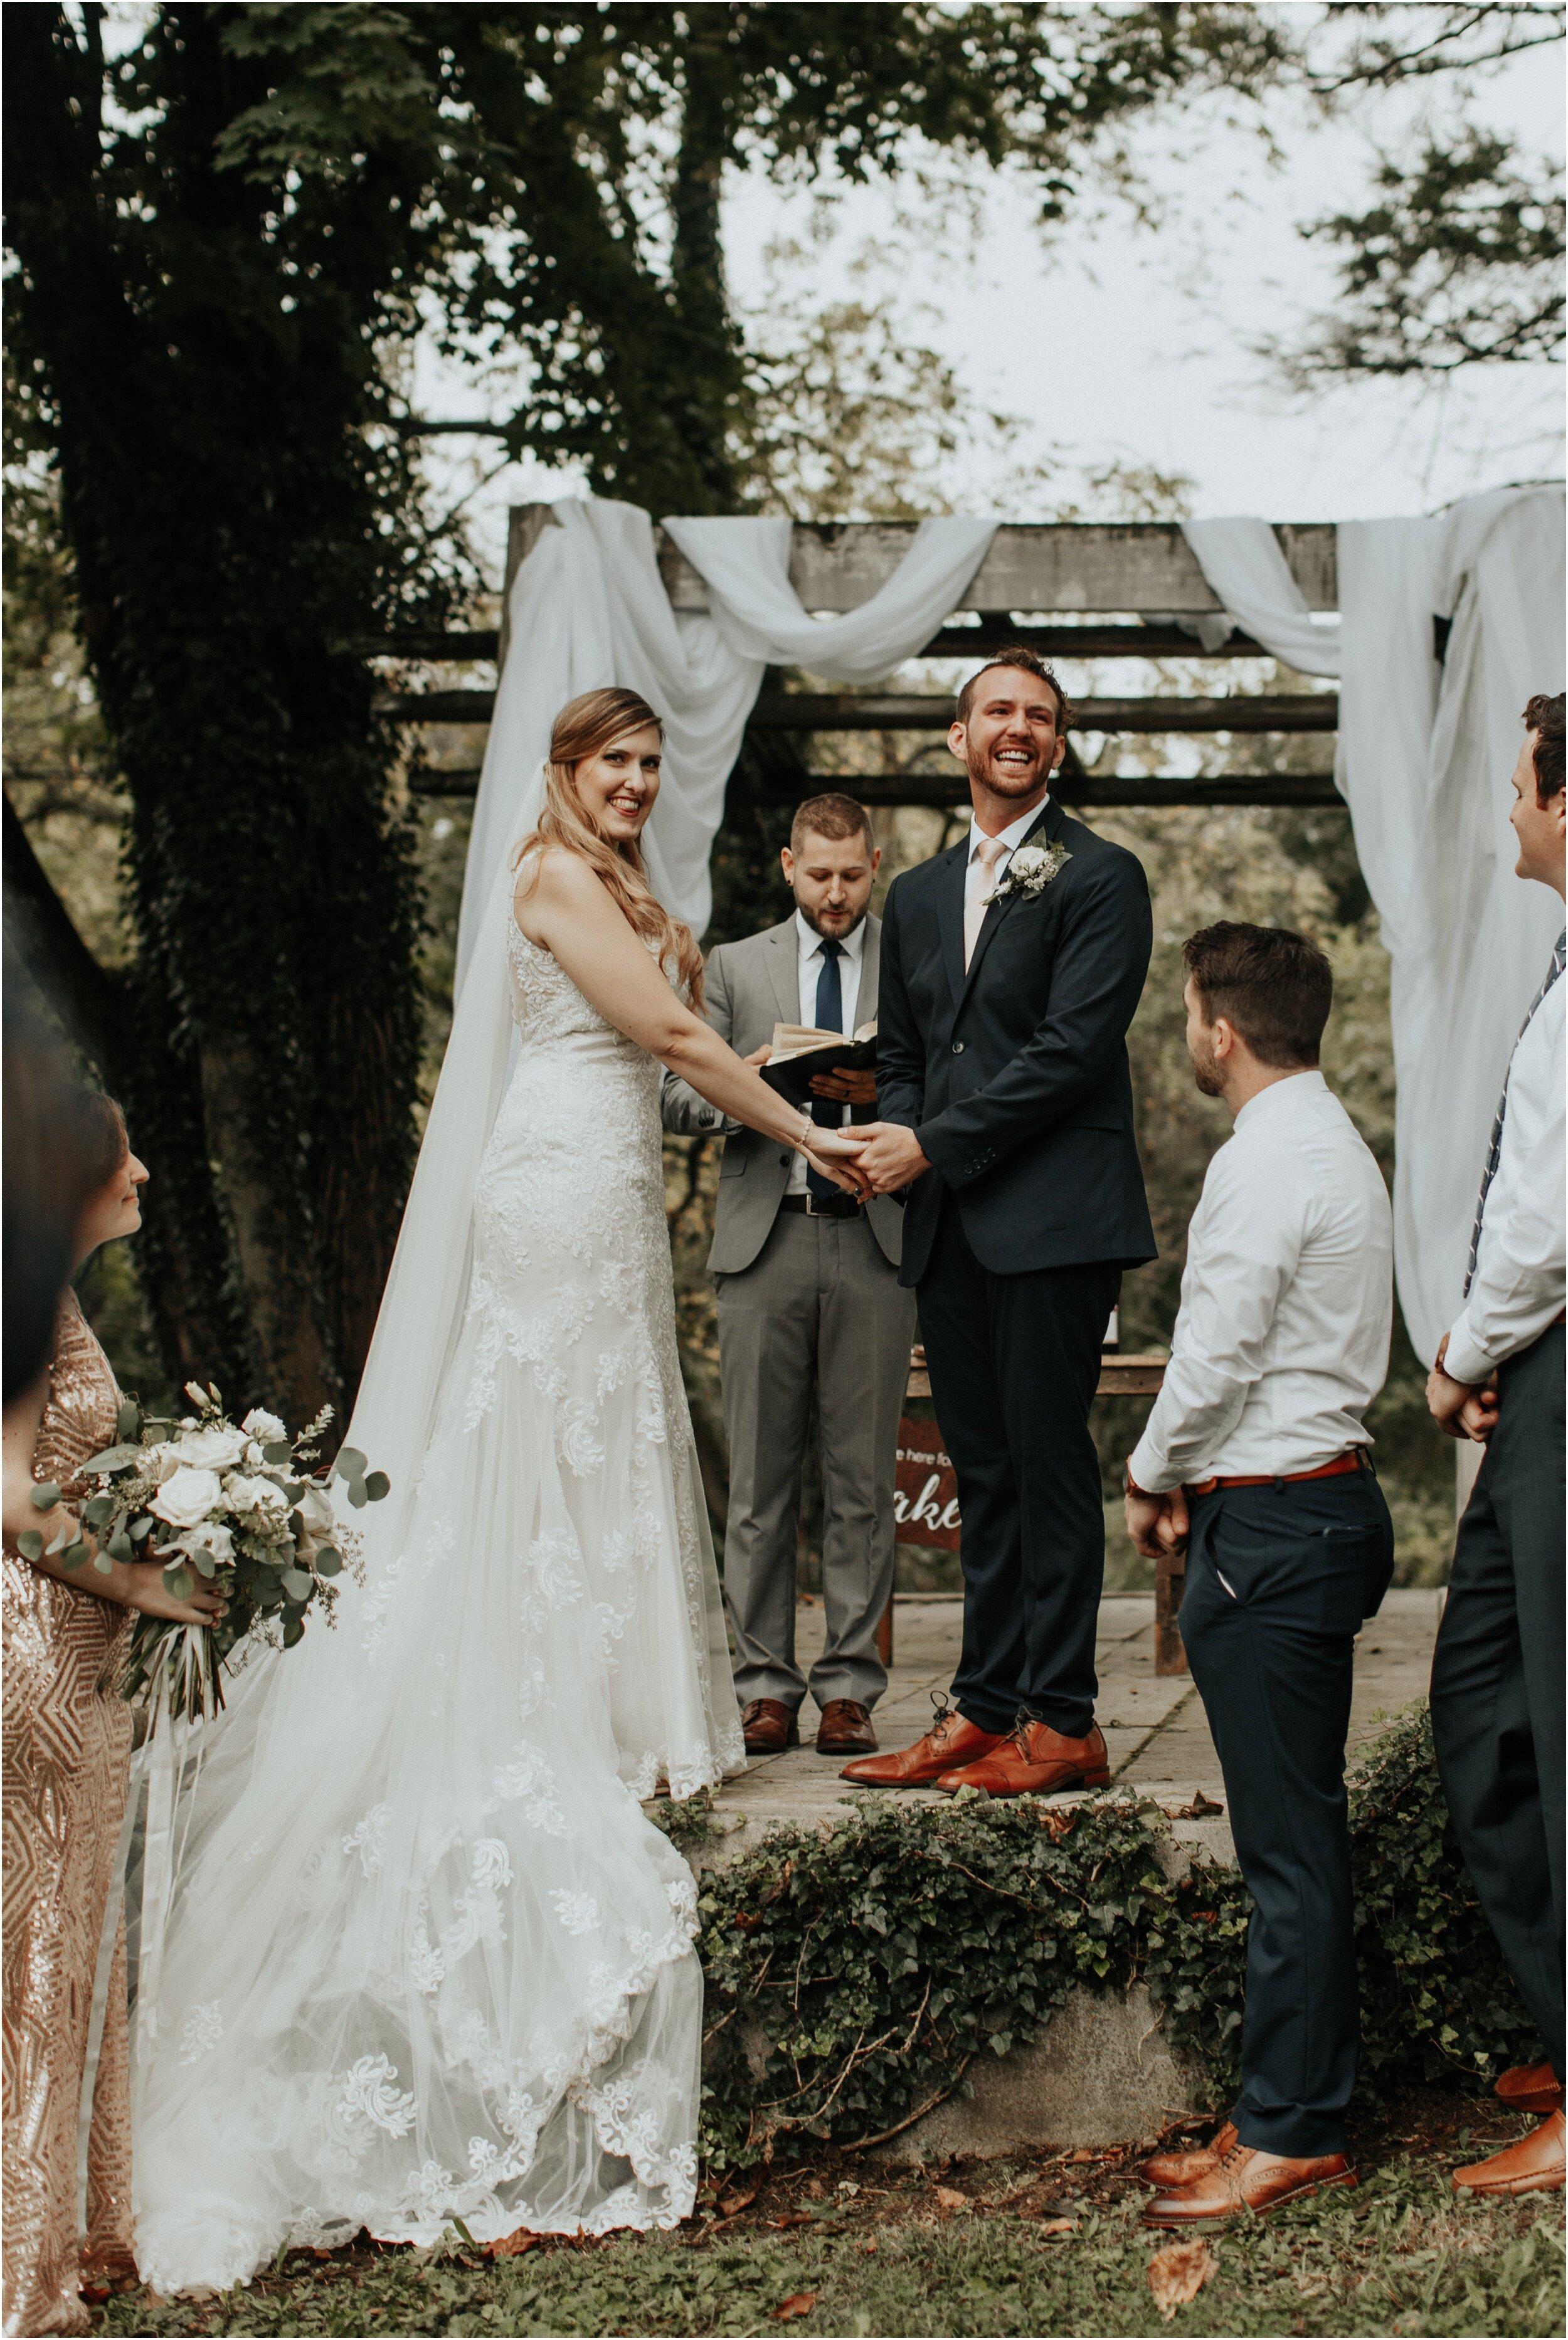 steph-and-jordan-cox-our-wedding-historic-shady-lane-compass-wedding-collective-hazel-lining-photography-destination-elopement-wedding-engagement-photography_0059.jpg